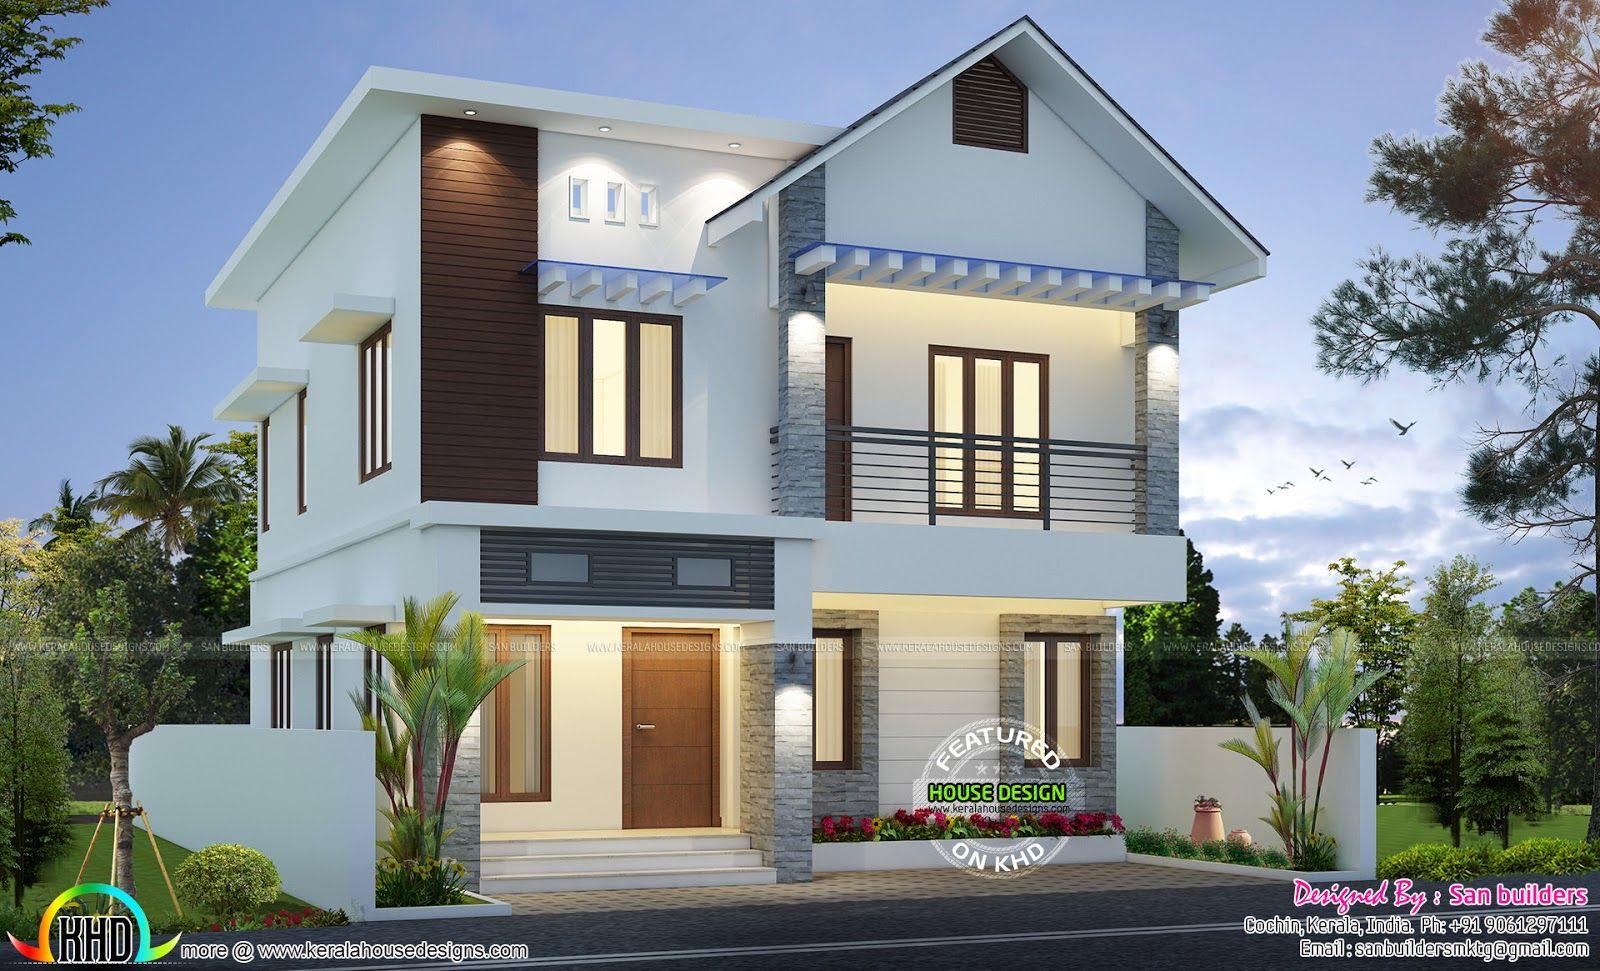 Cute modern home house plans also sq ft plan pinterest rh